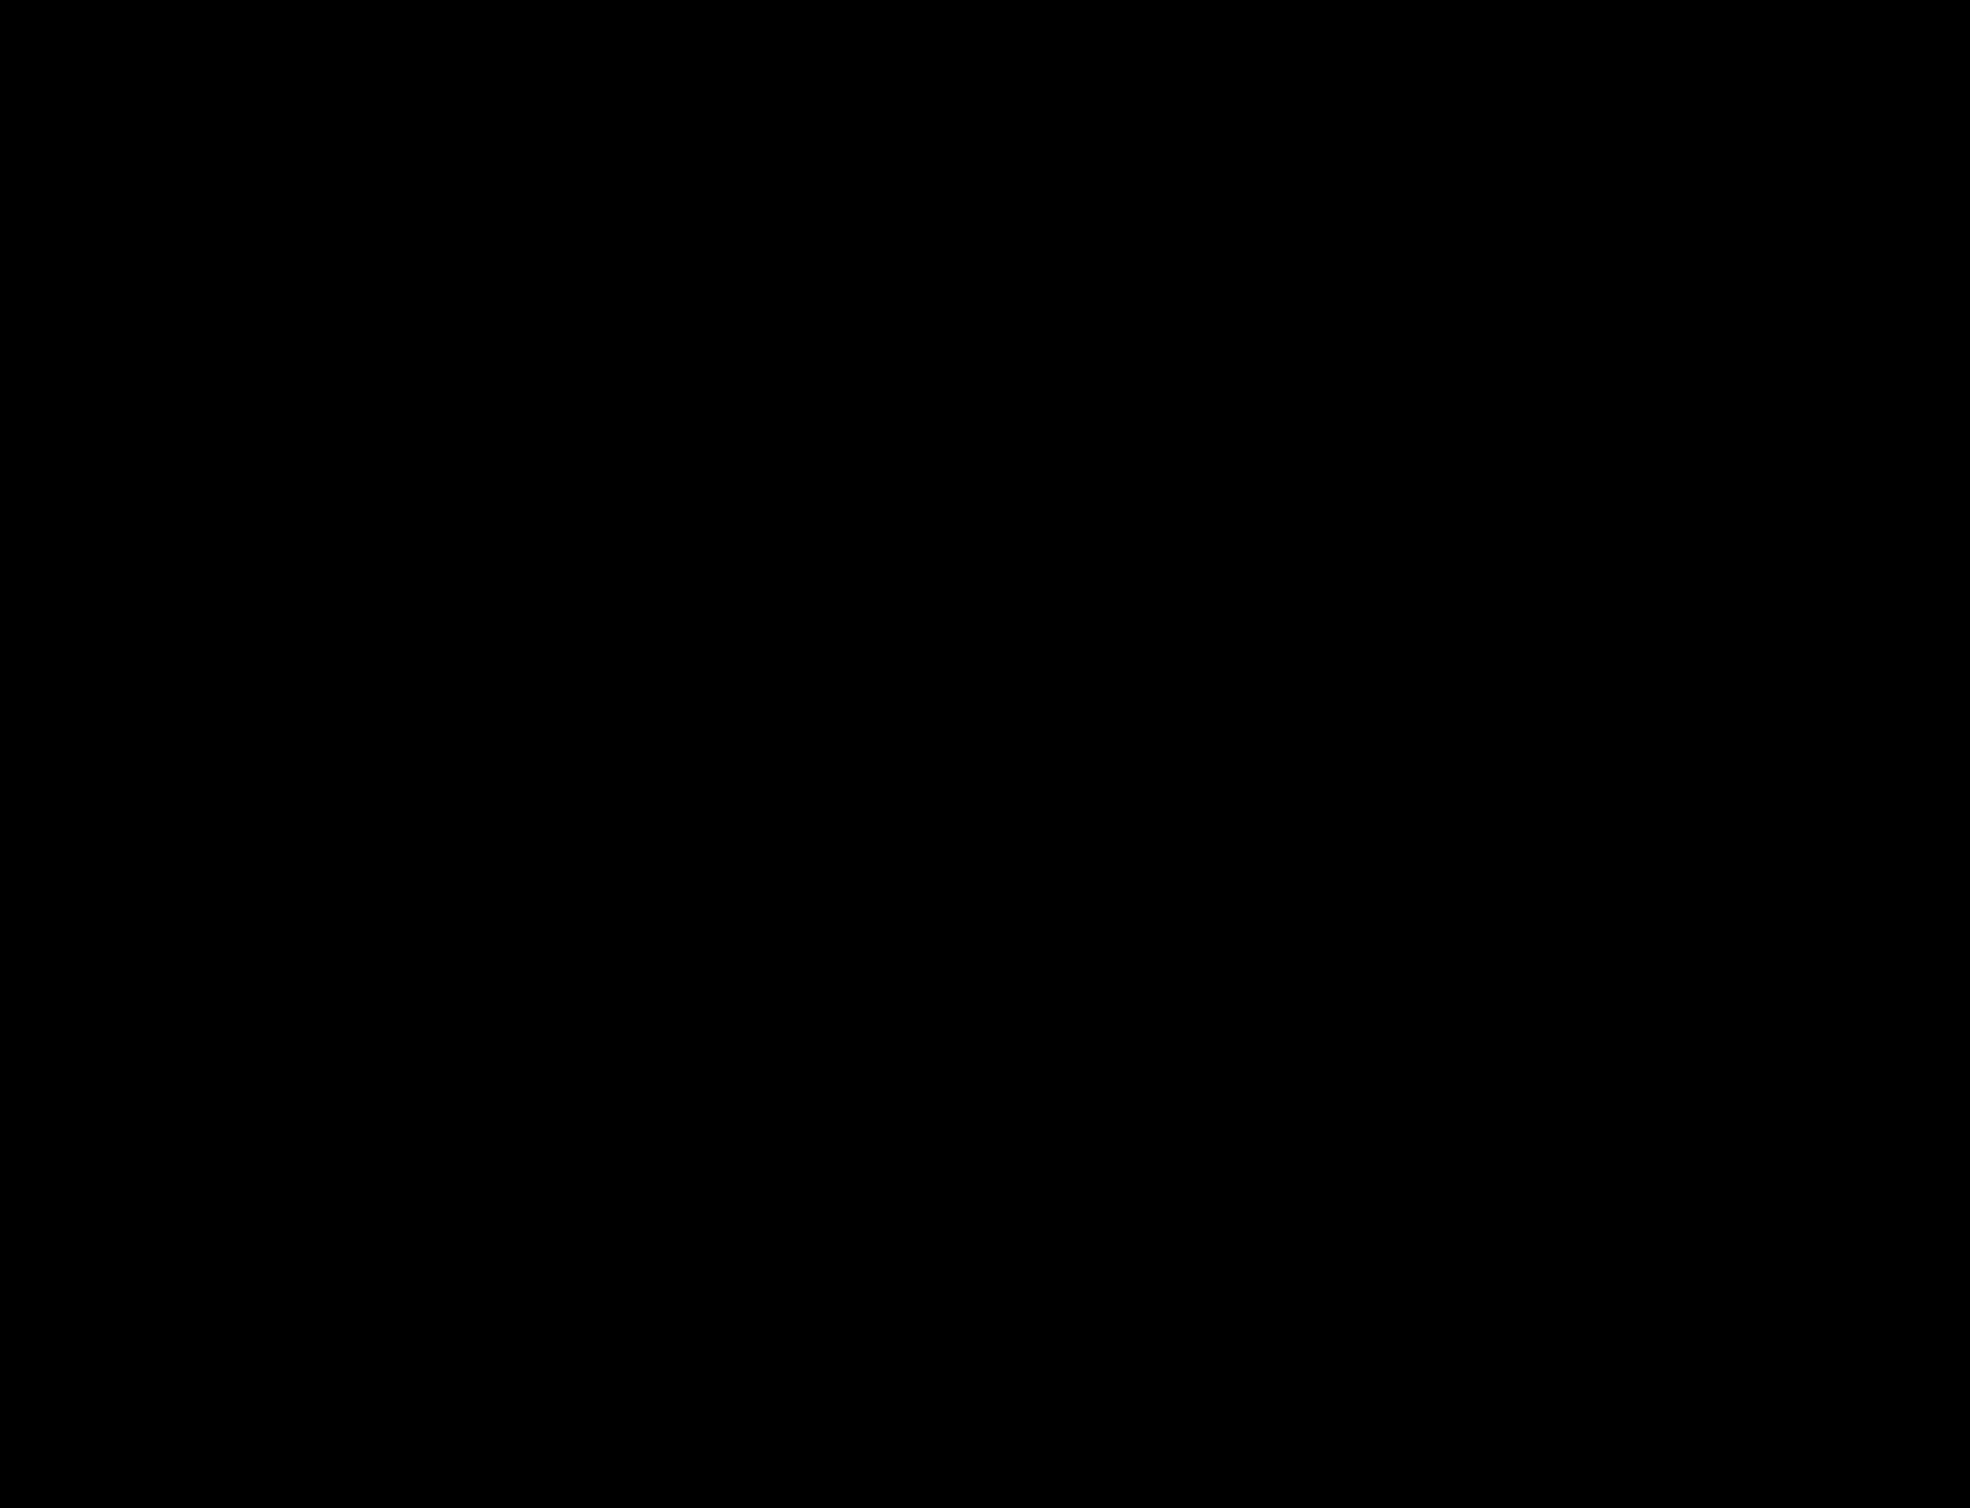 Halo Logo Transparent